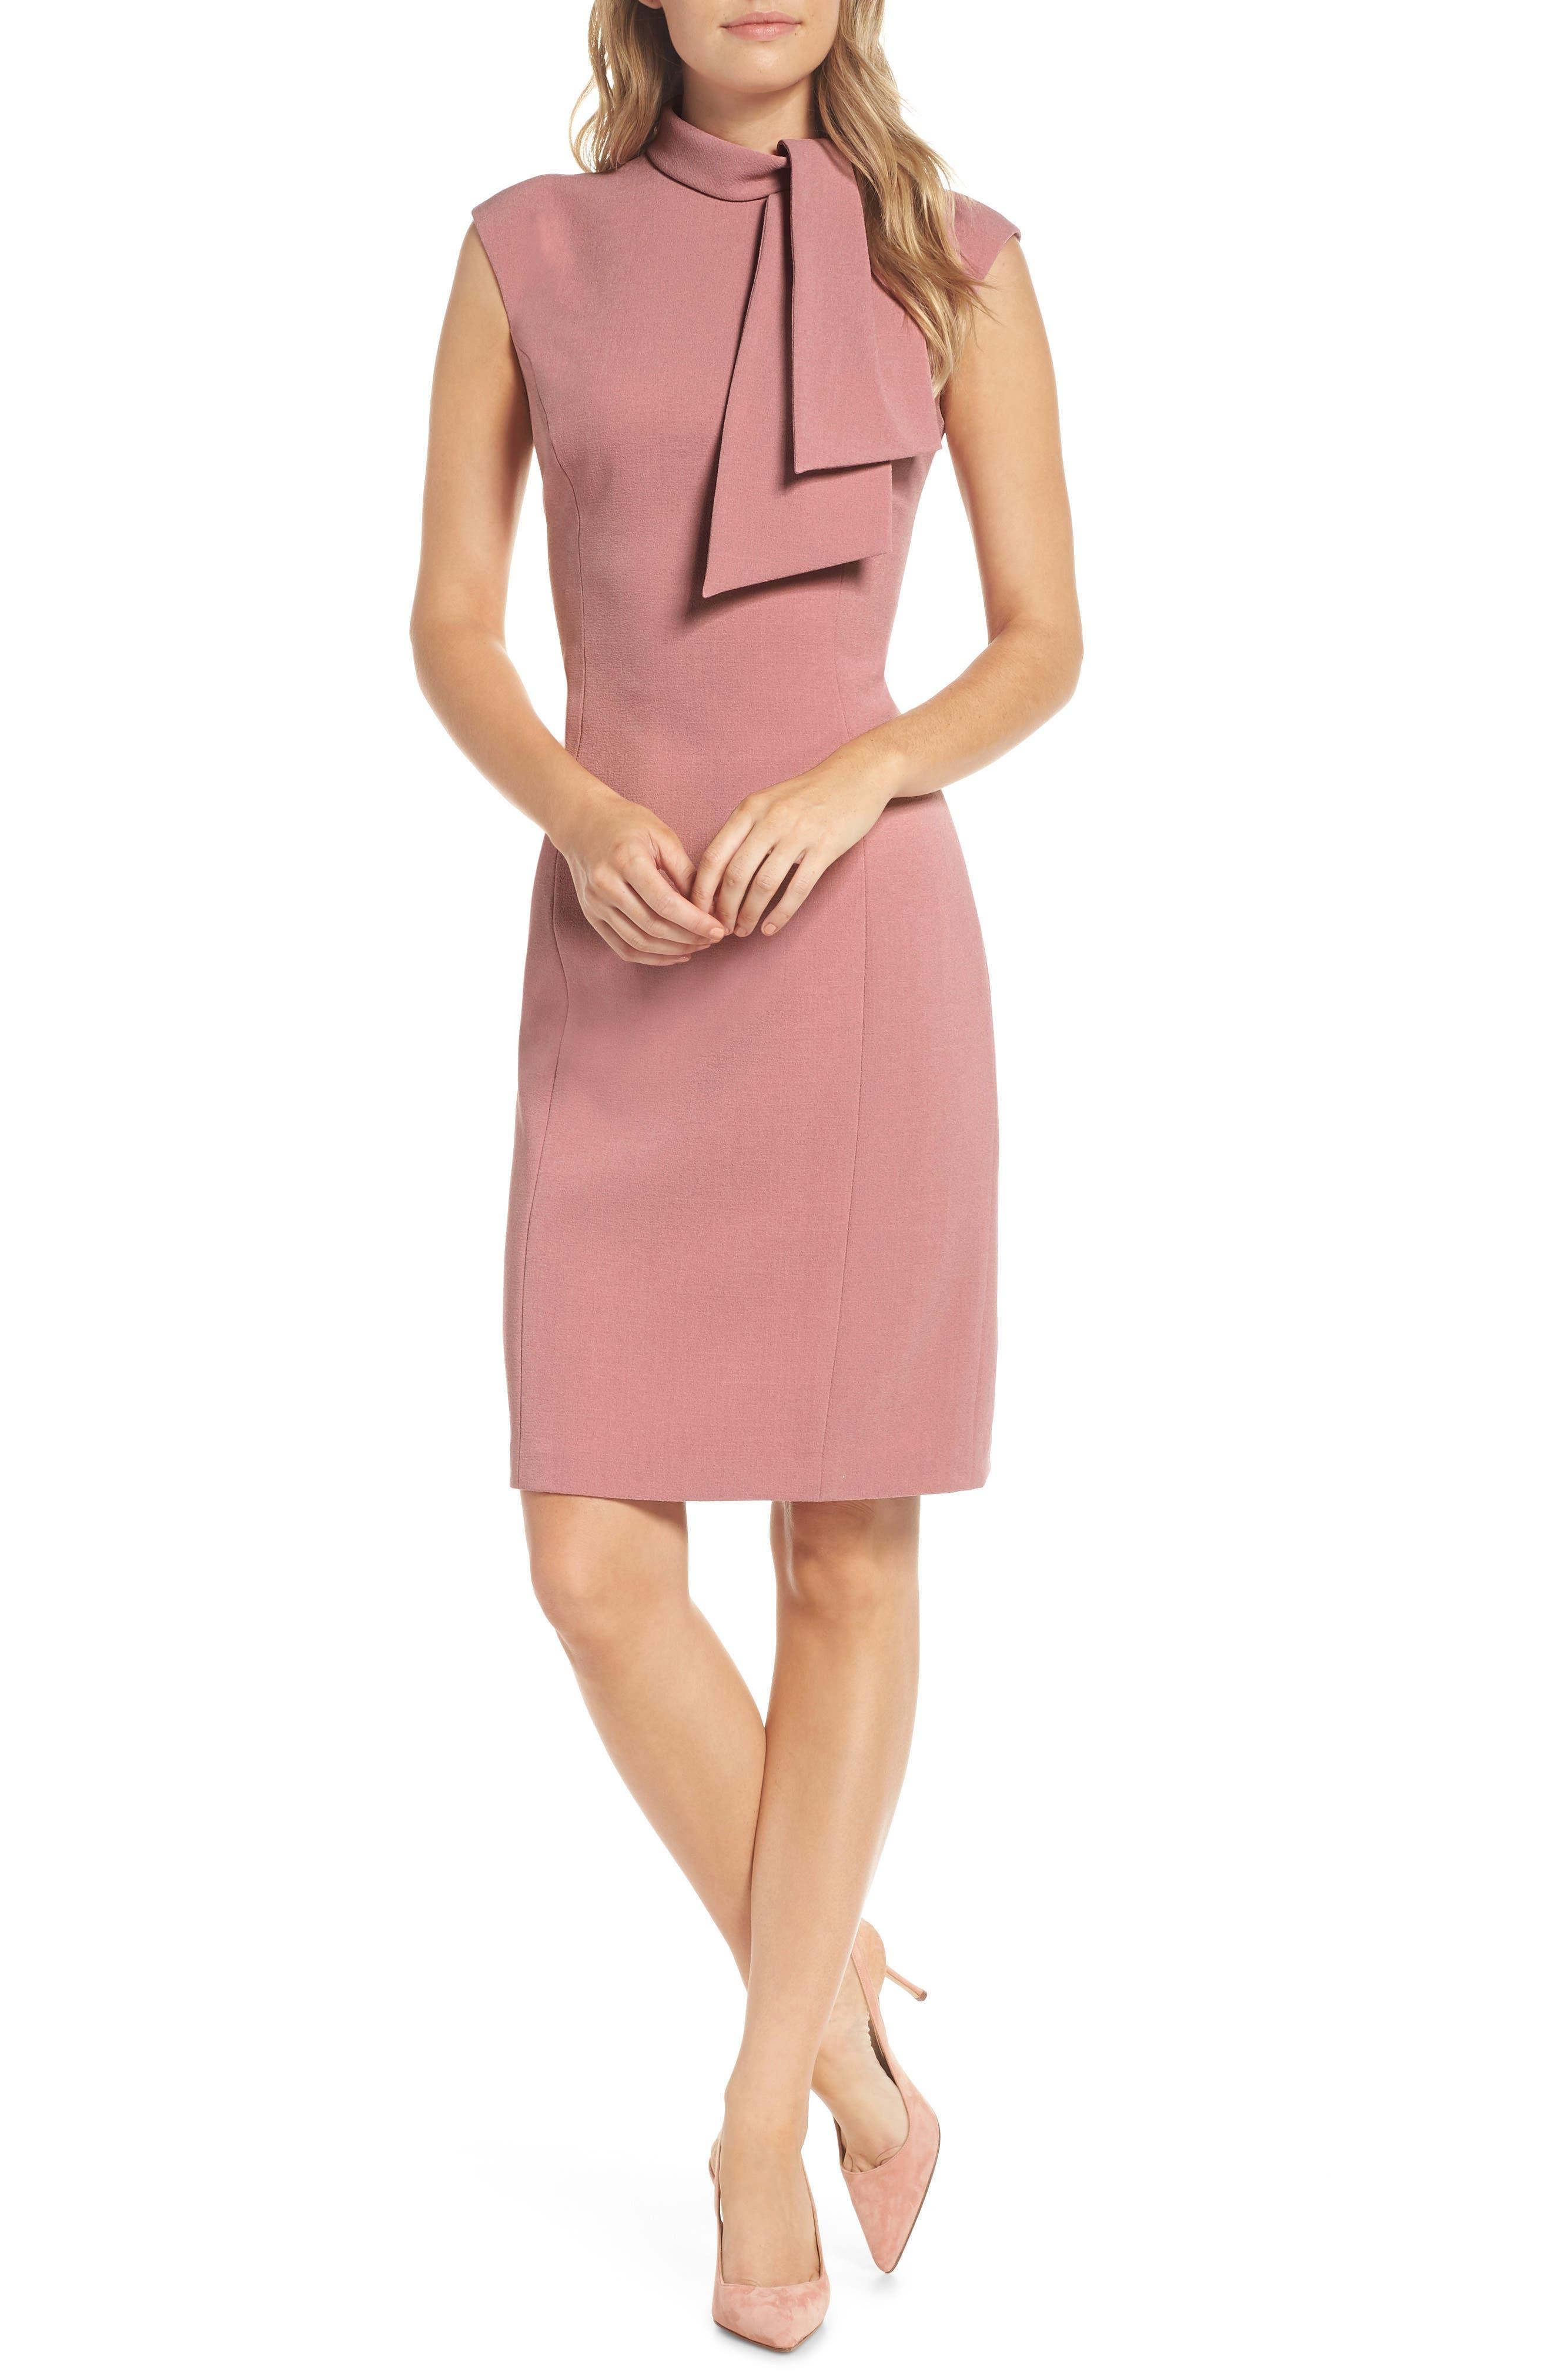 Petite Harper Rose Tie Neck Sheath Dress, Pink